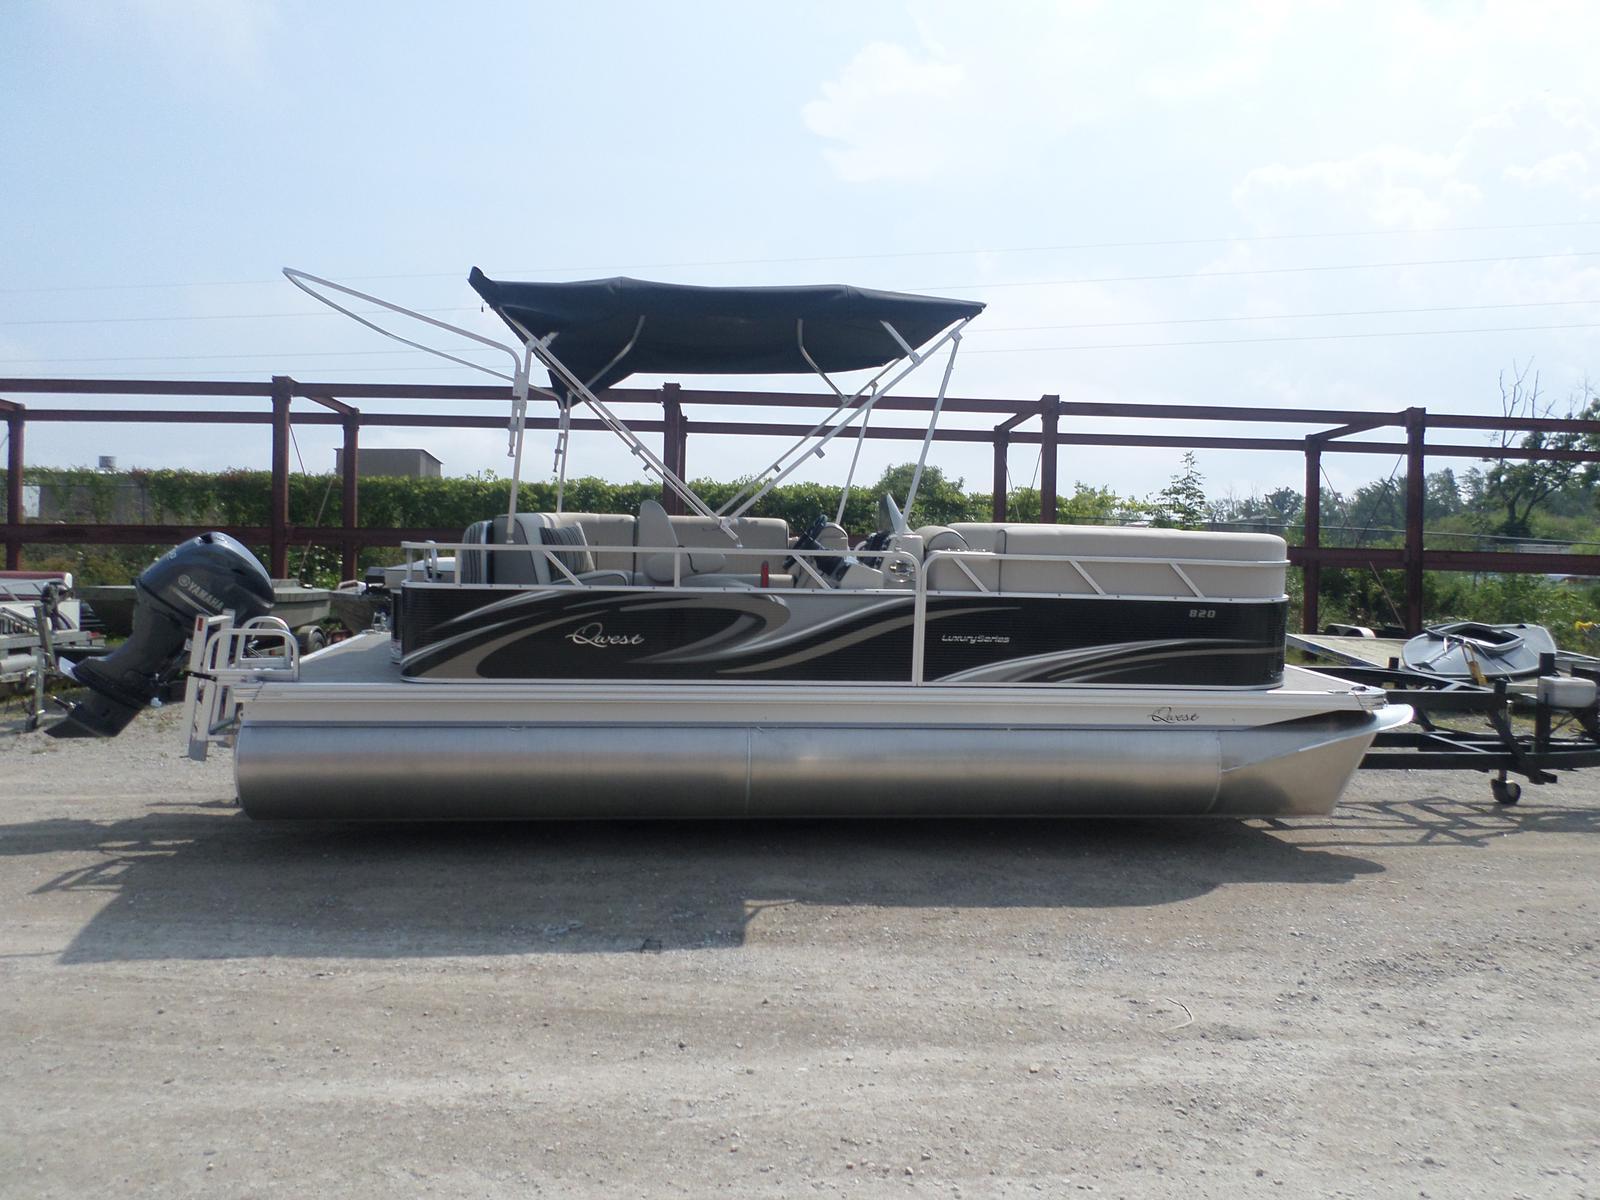 Apex Qwest 820 LS Lanai Cruise